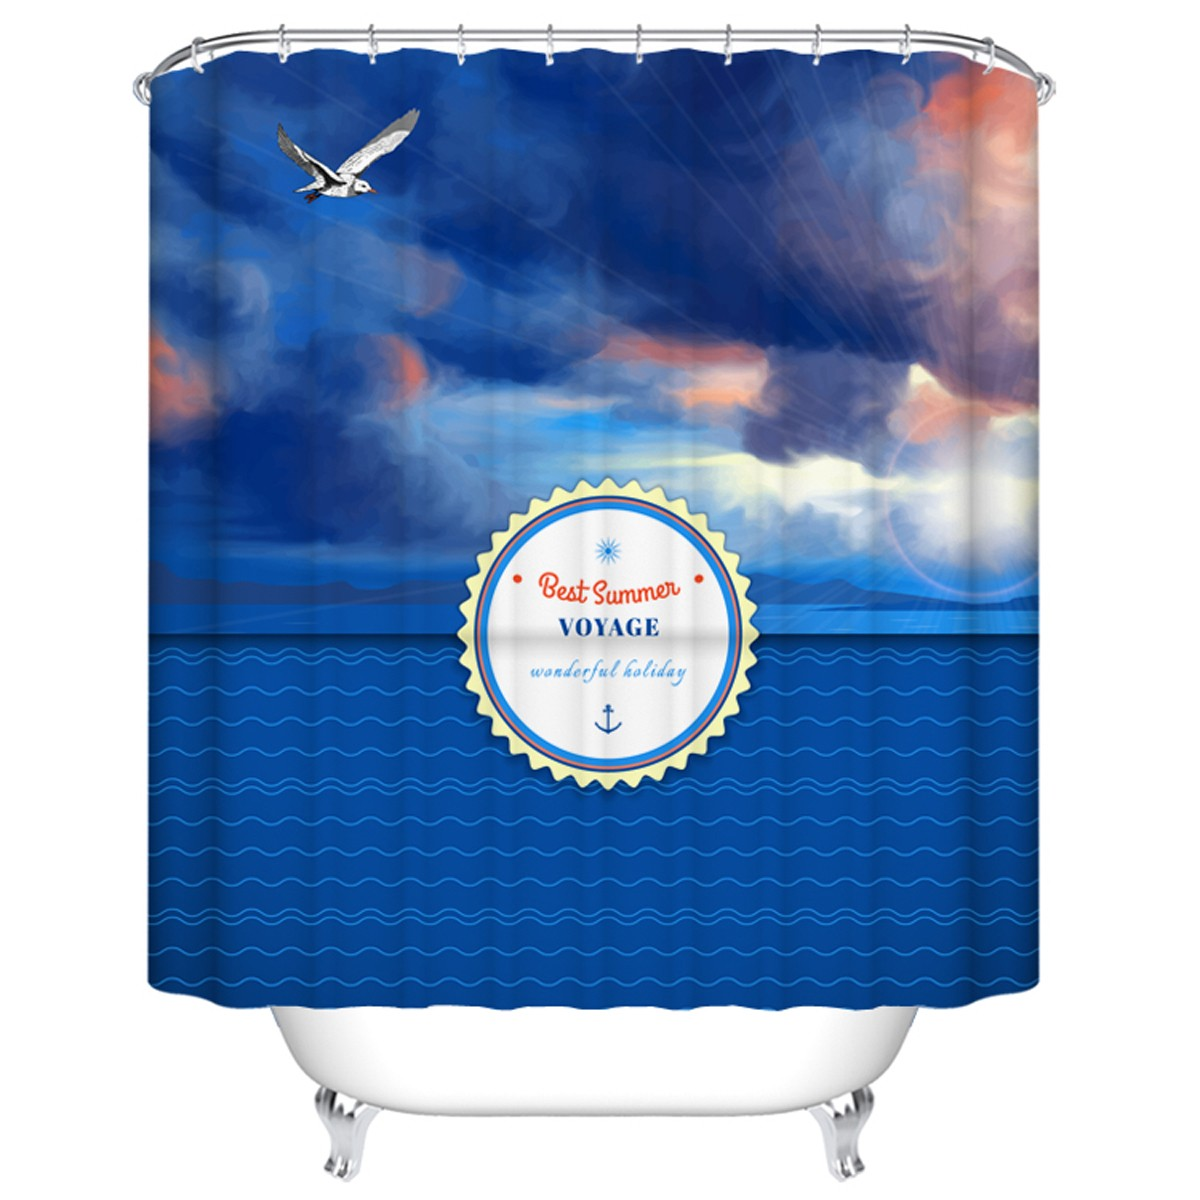 "Bathroom Waterproof Shower Curtain, 70"" W x 72"" H (DK-YT032)"